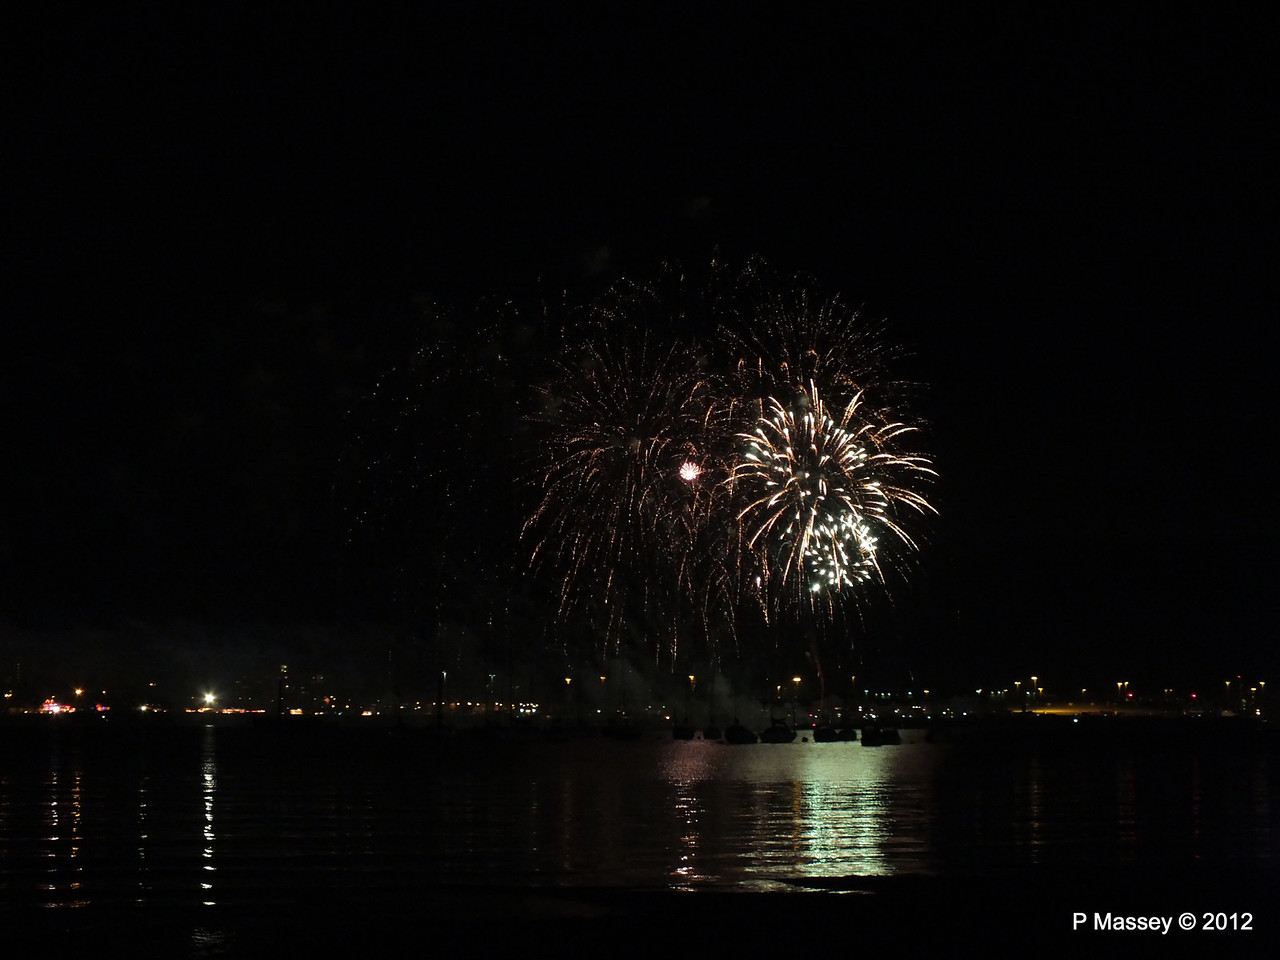 Fireworks off Mayflower Park PDM 03-11-2012 20-55-34